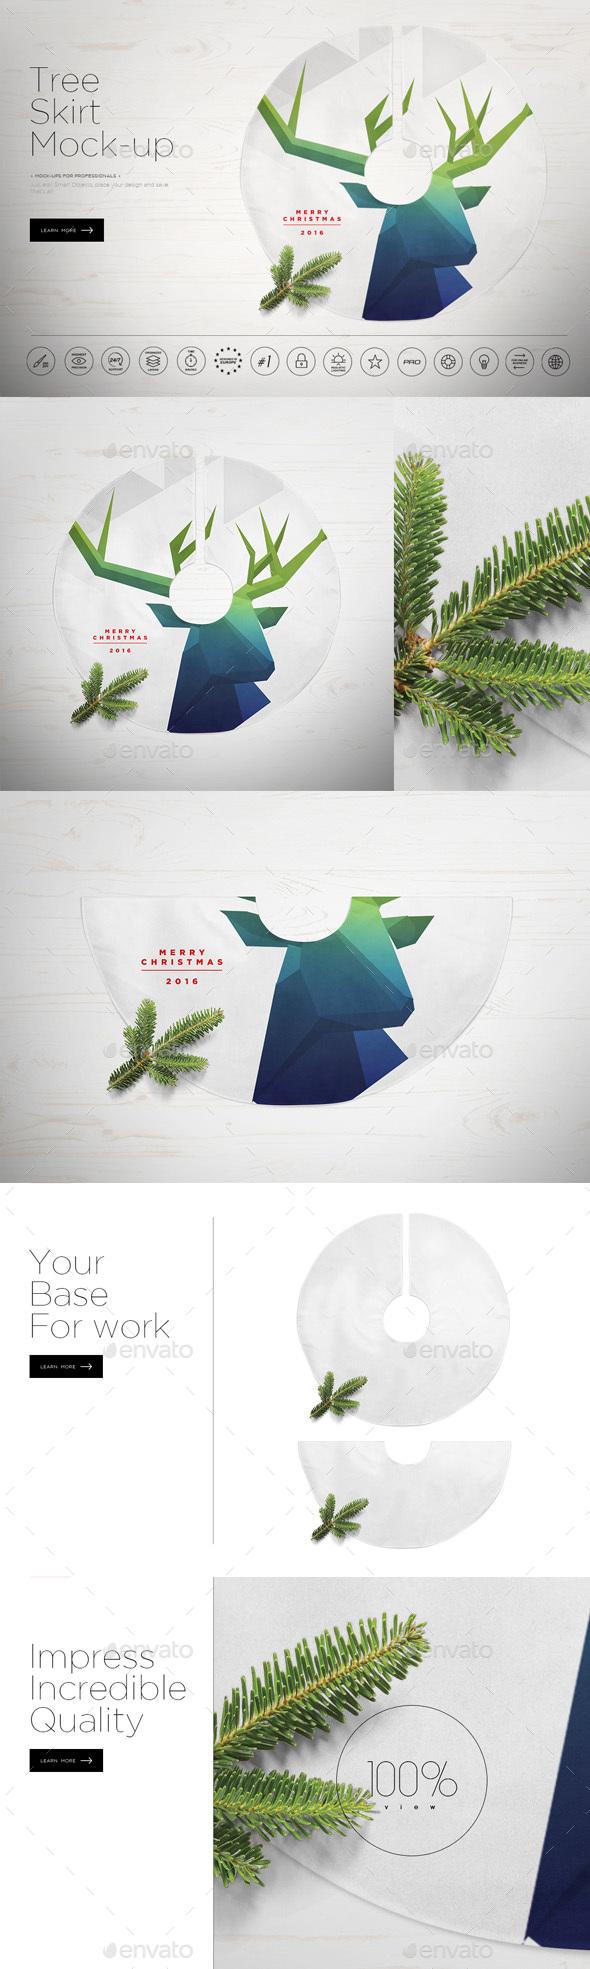 Tree Skirt Mock-up - Miscellaneous Product Mock-Ups